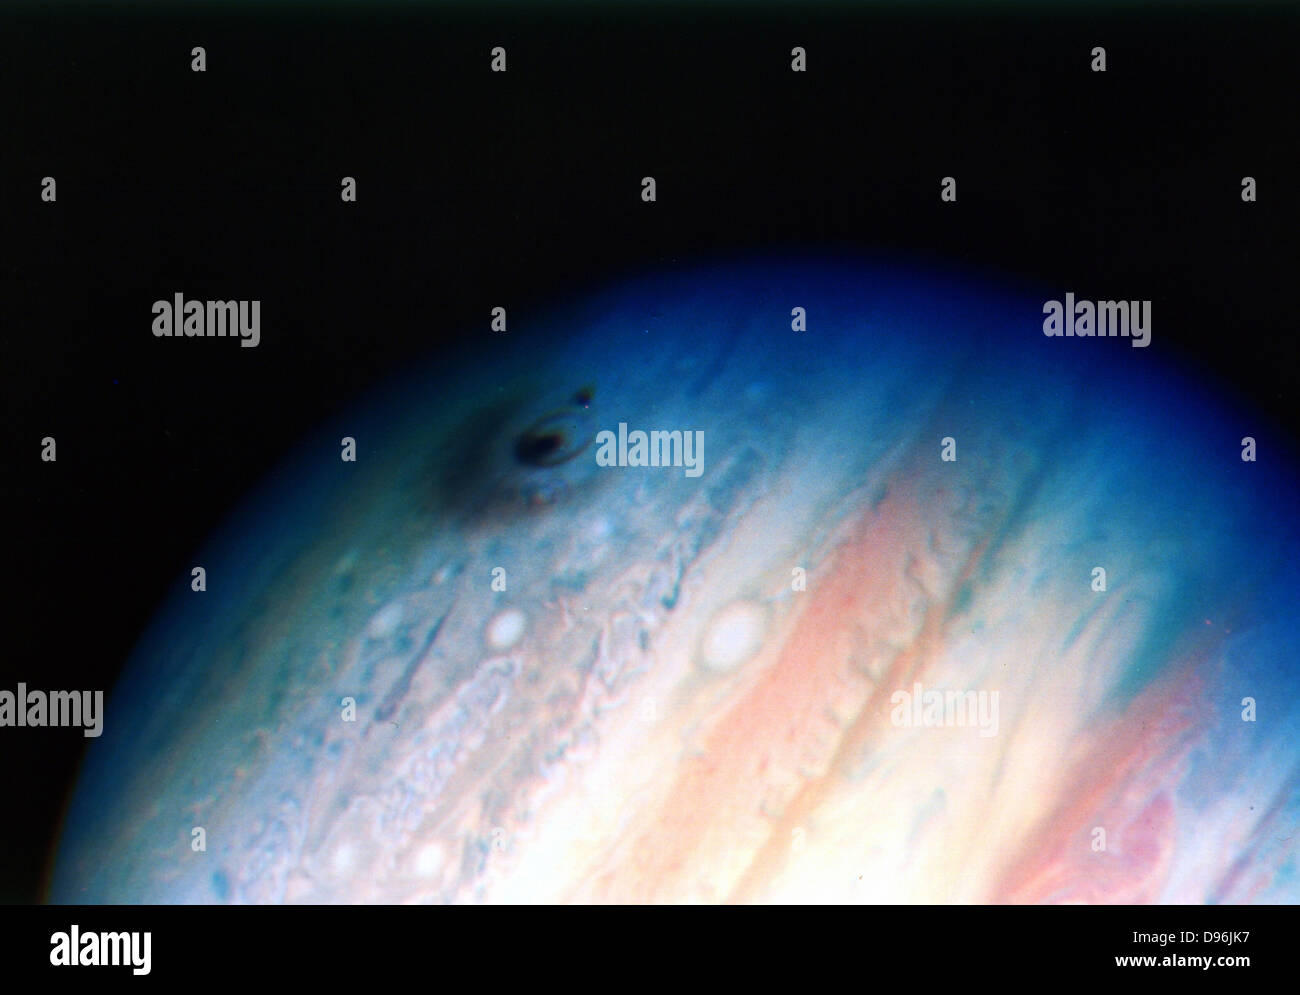 Comet Shoemaker-Levy, 1994. Impact with Jupiter 20 July 1994. NASA photograph. - Stock Image